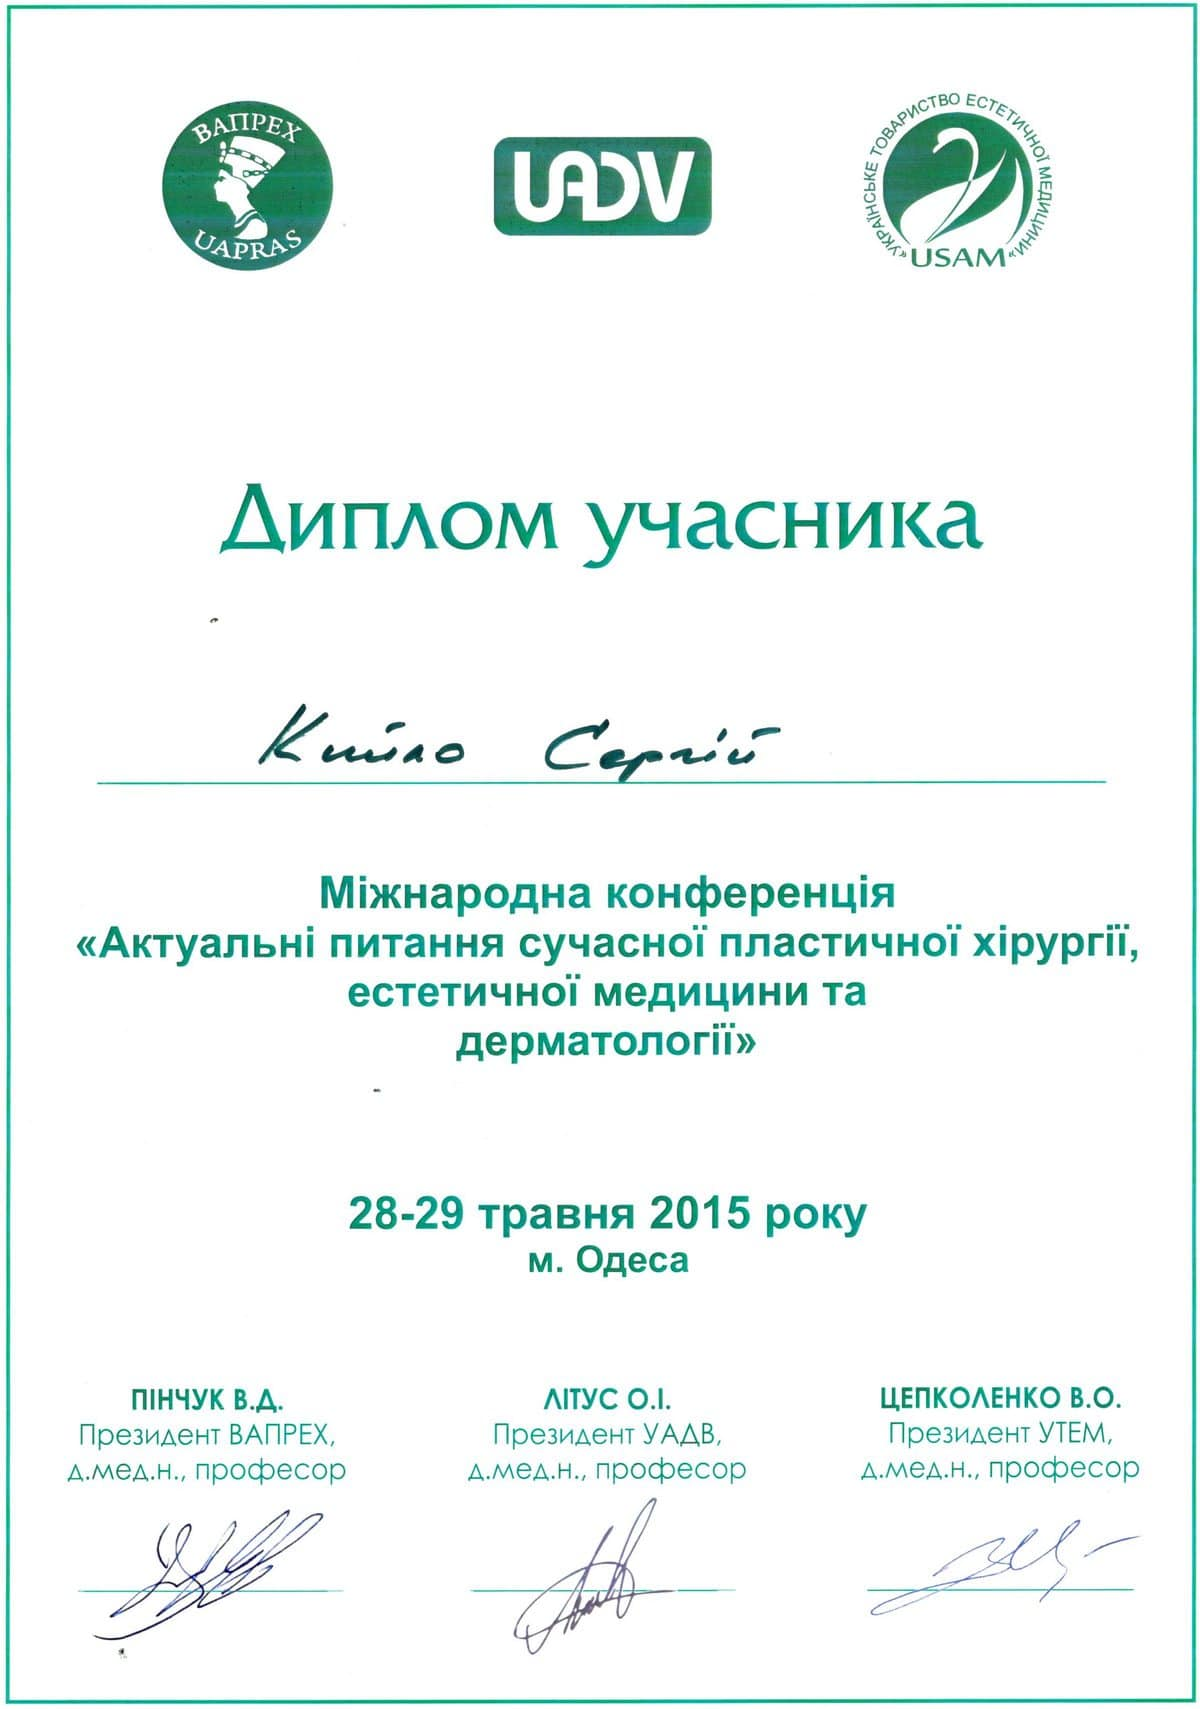 Документ №:35 Сертификат пластического хирурга Кийло Сергея Алексеевича